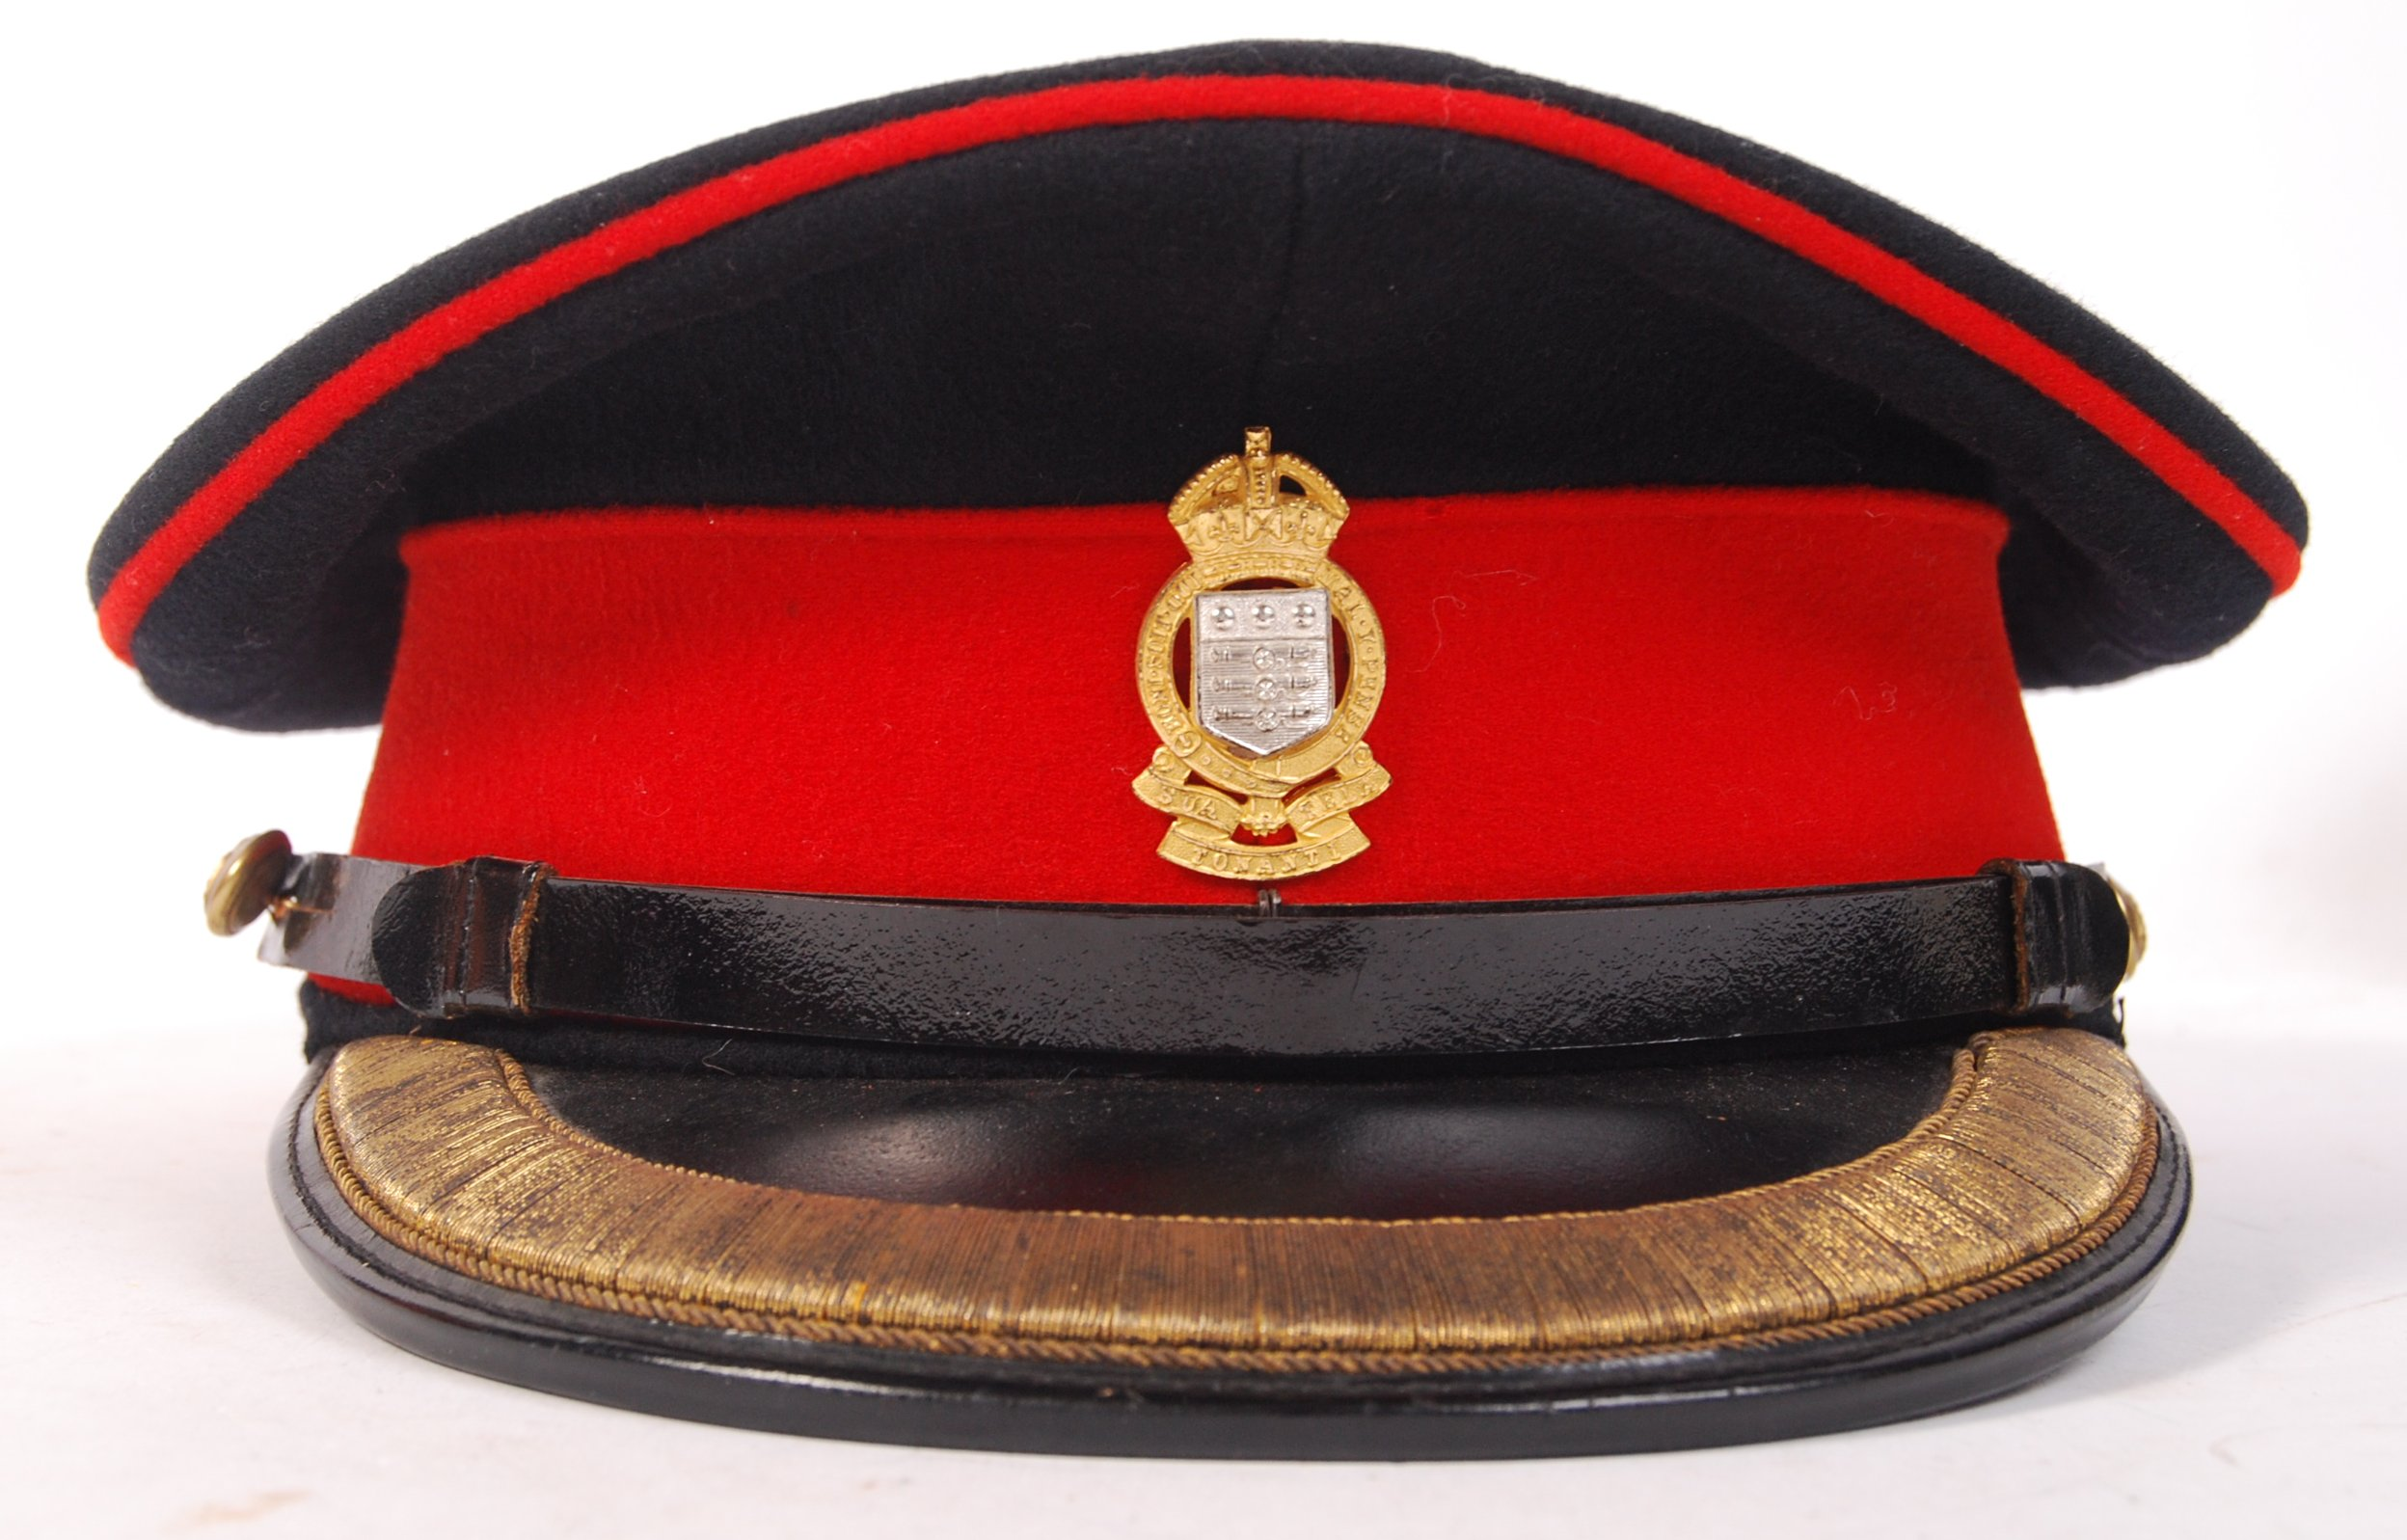 Lot 43 - POST-WWII SECOND WORLD WAR RAOC OFFICER'S DRESS CA